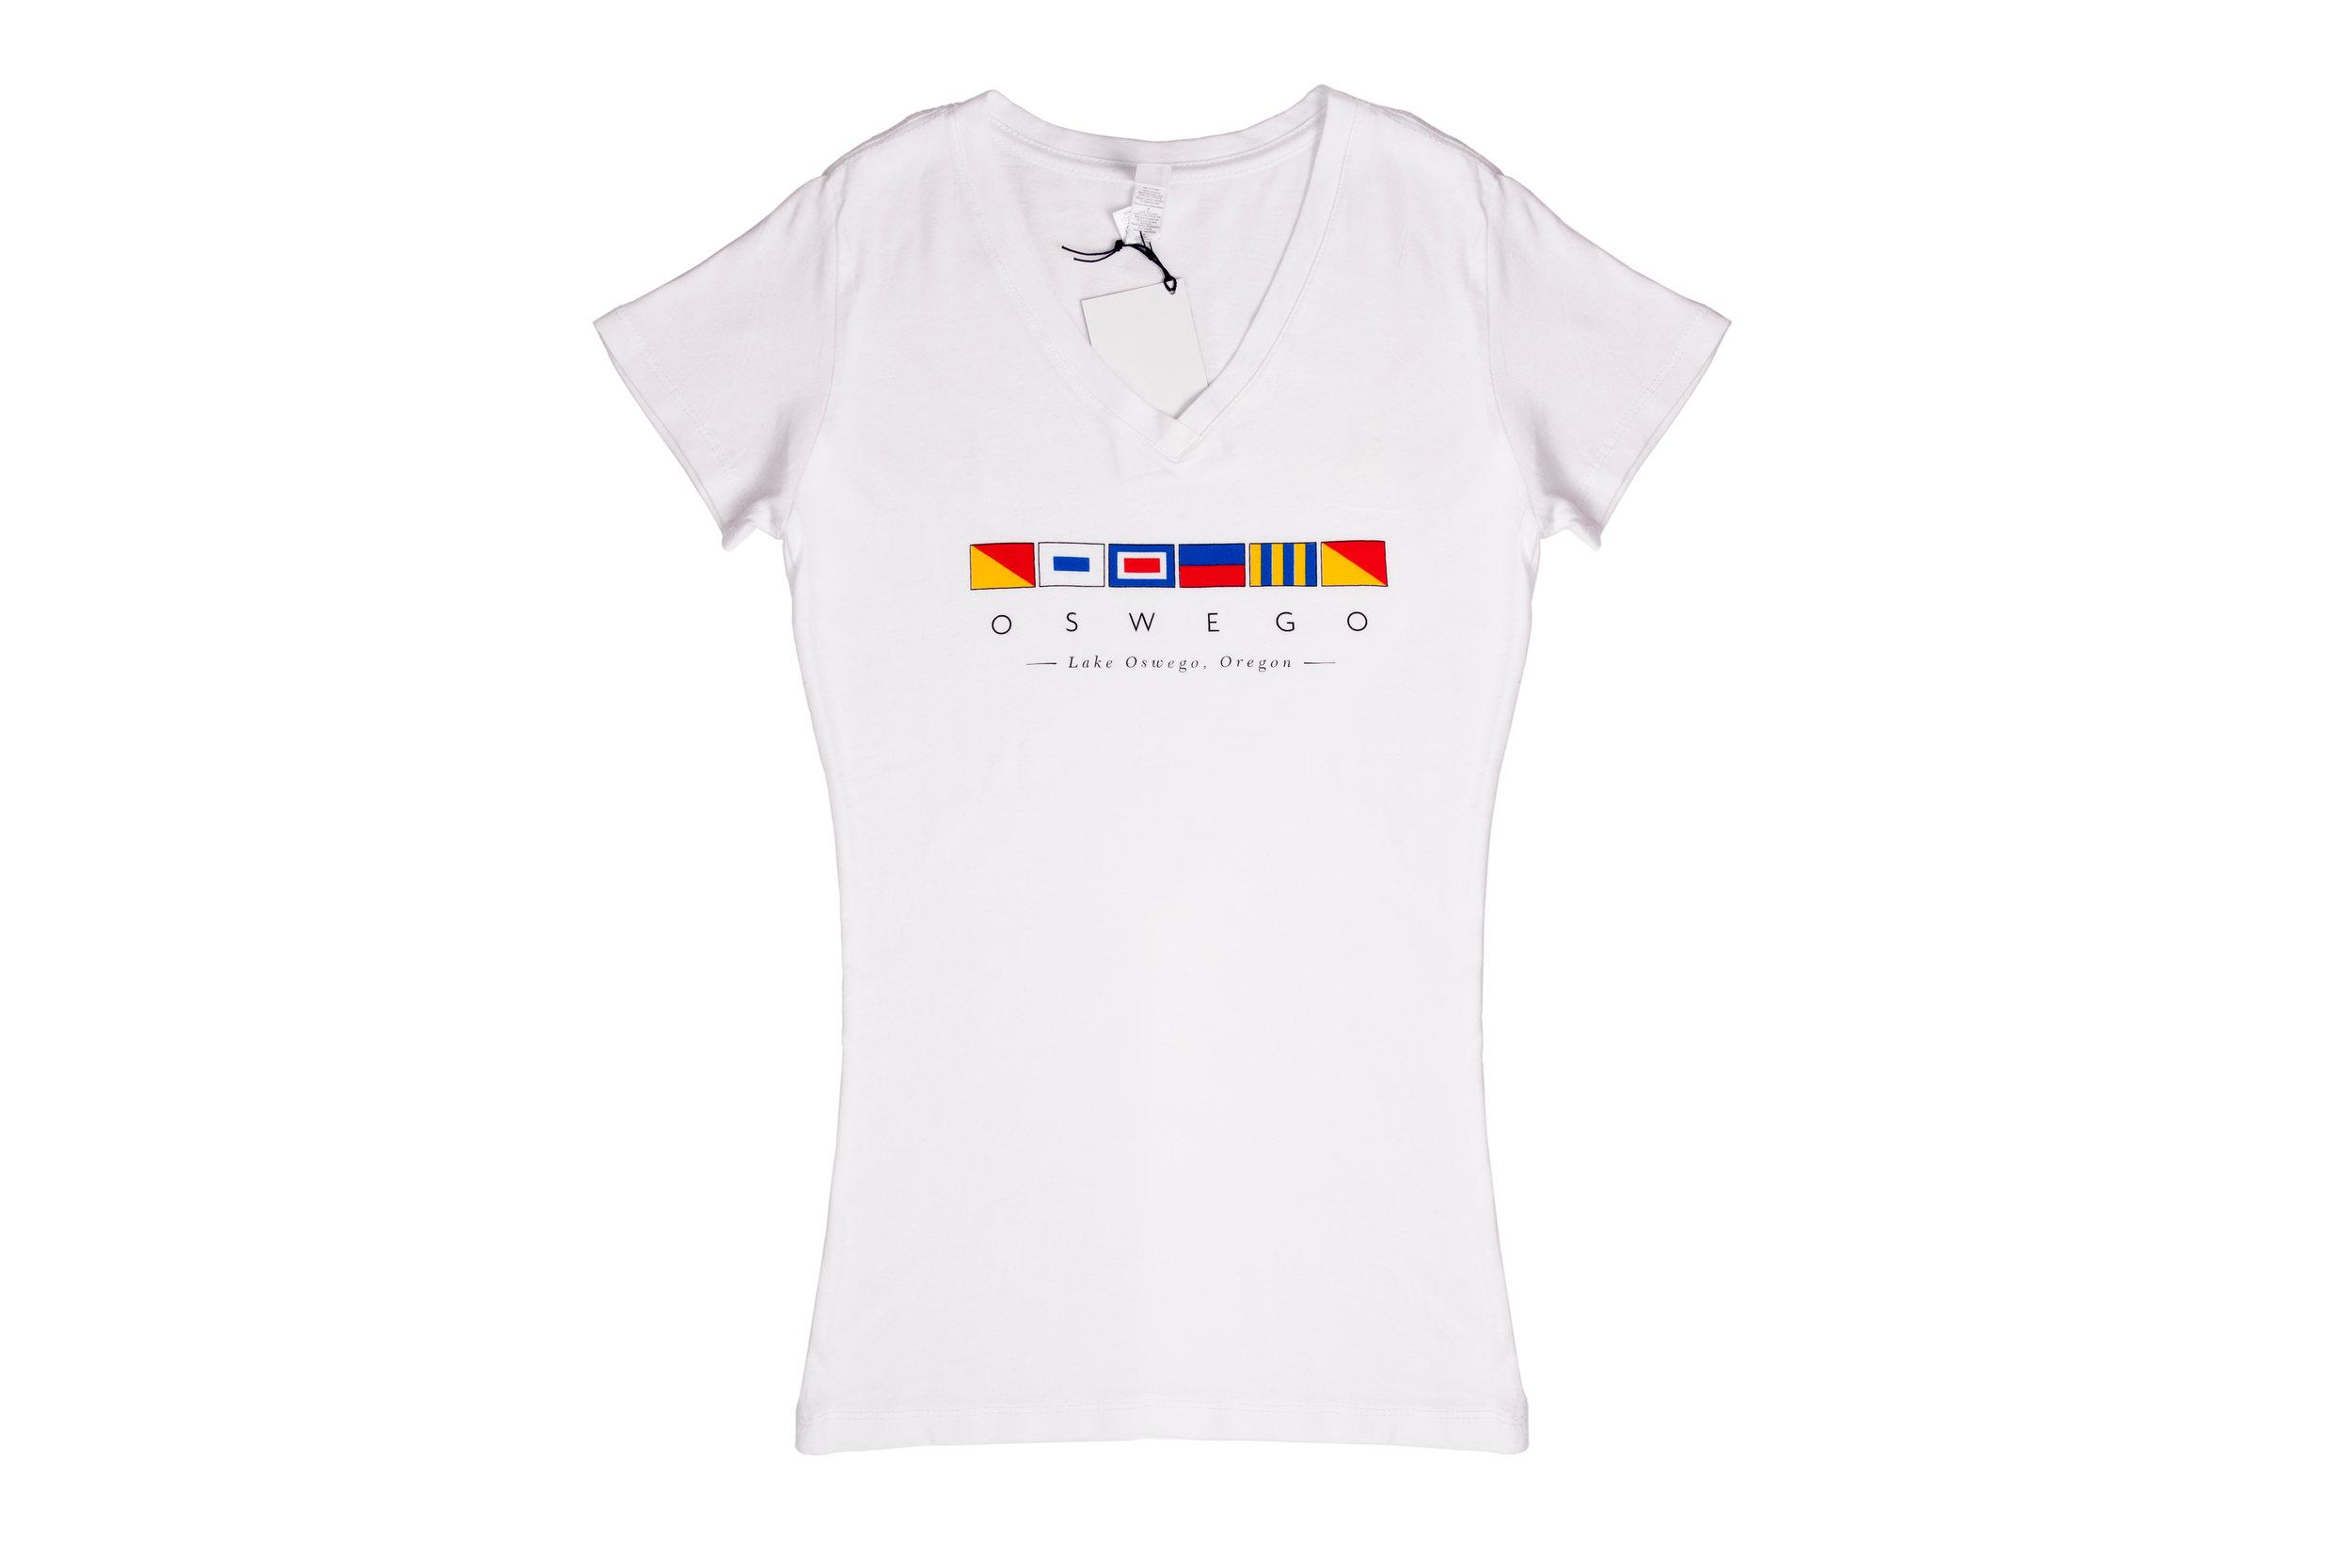 InternationalSignalFlagOSWEGOTShirt.jpg